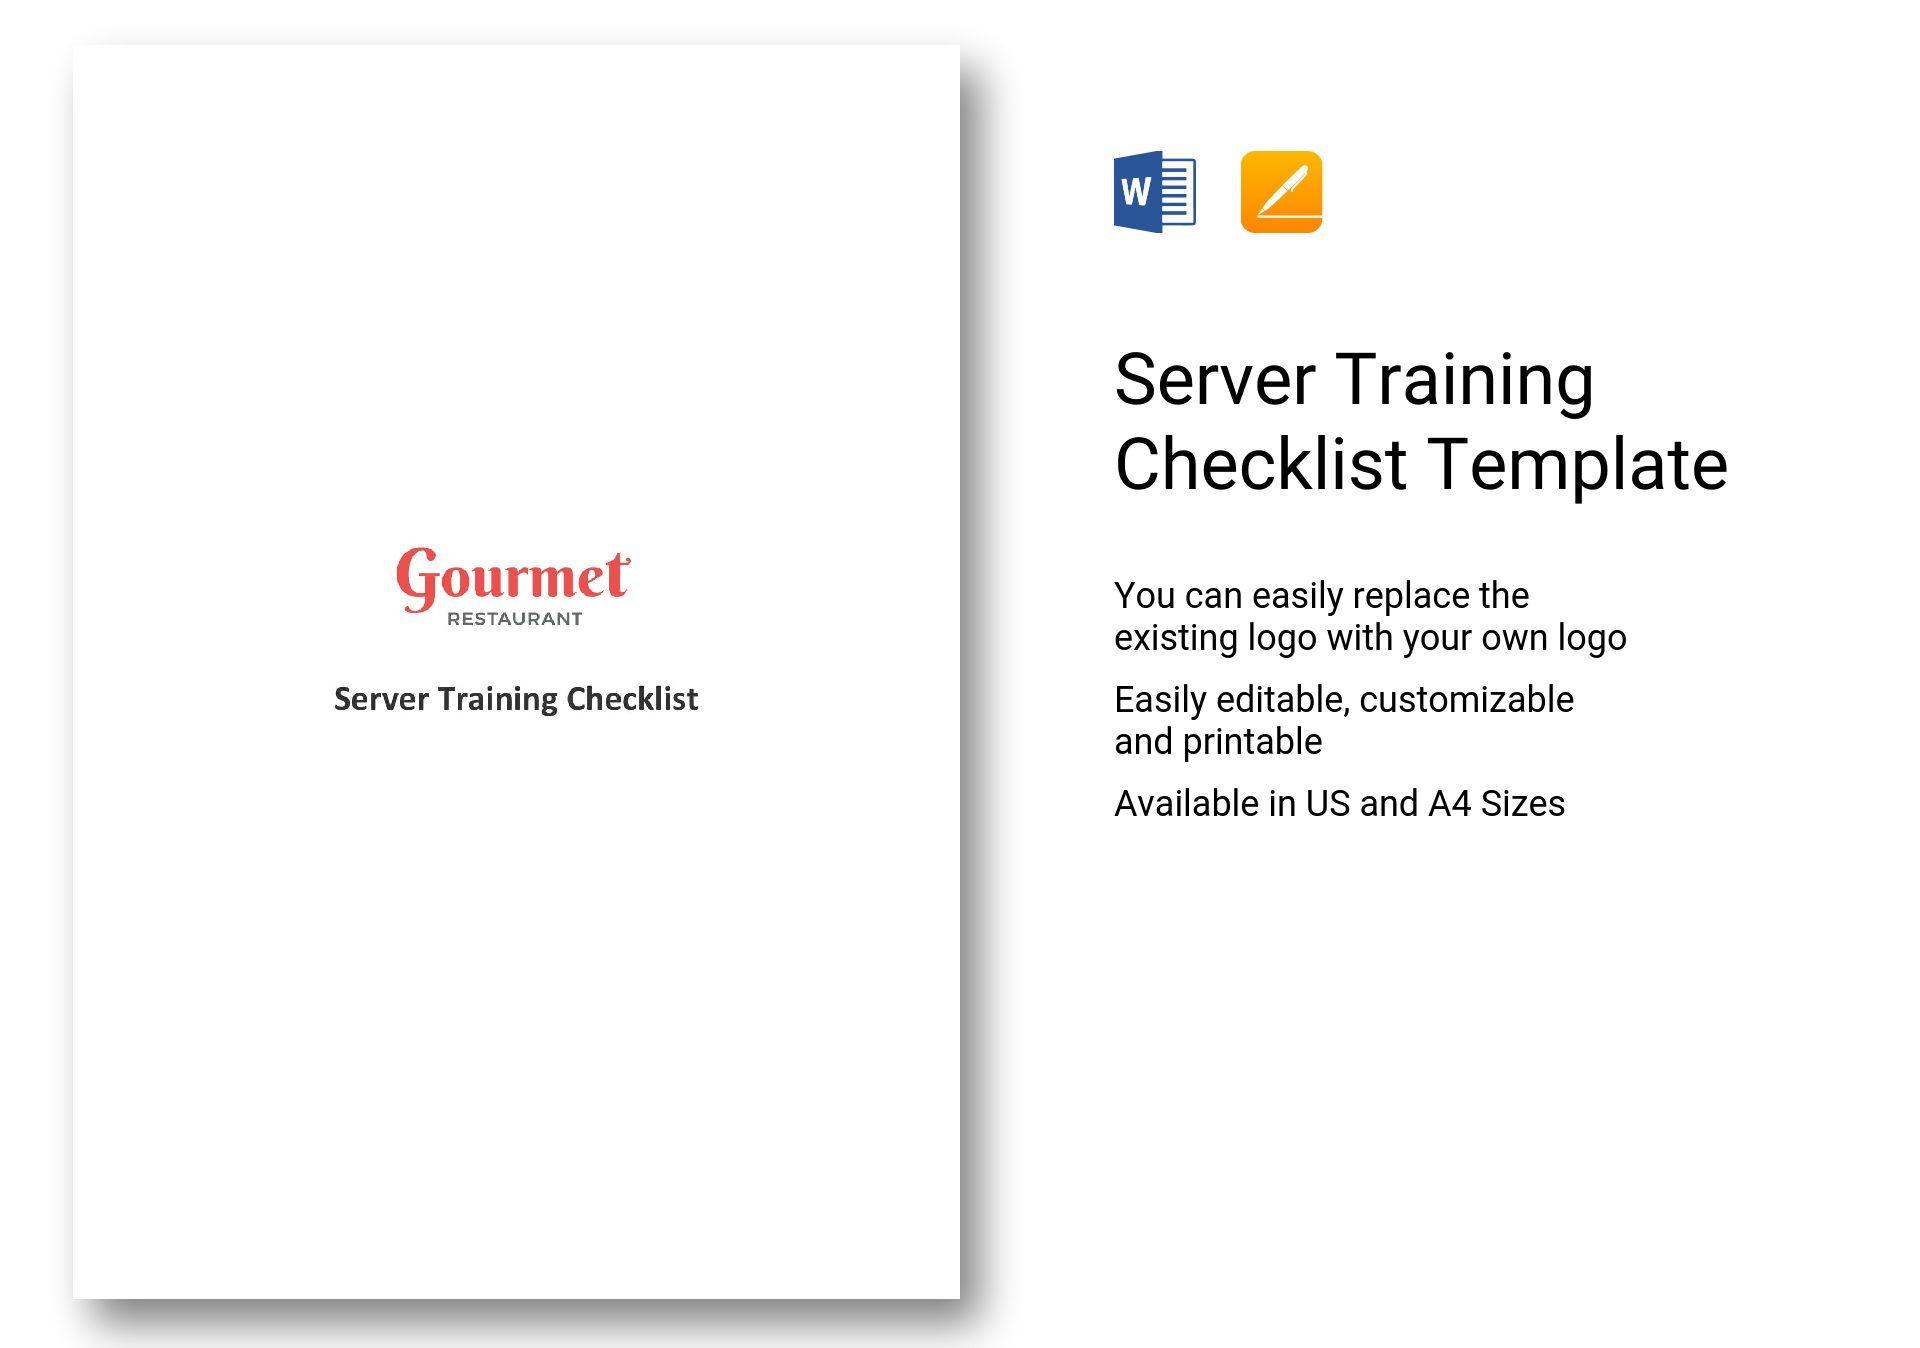 Server Training Checklist